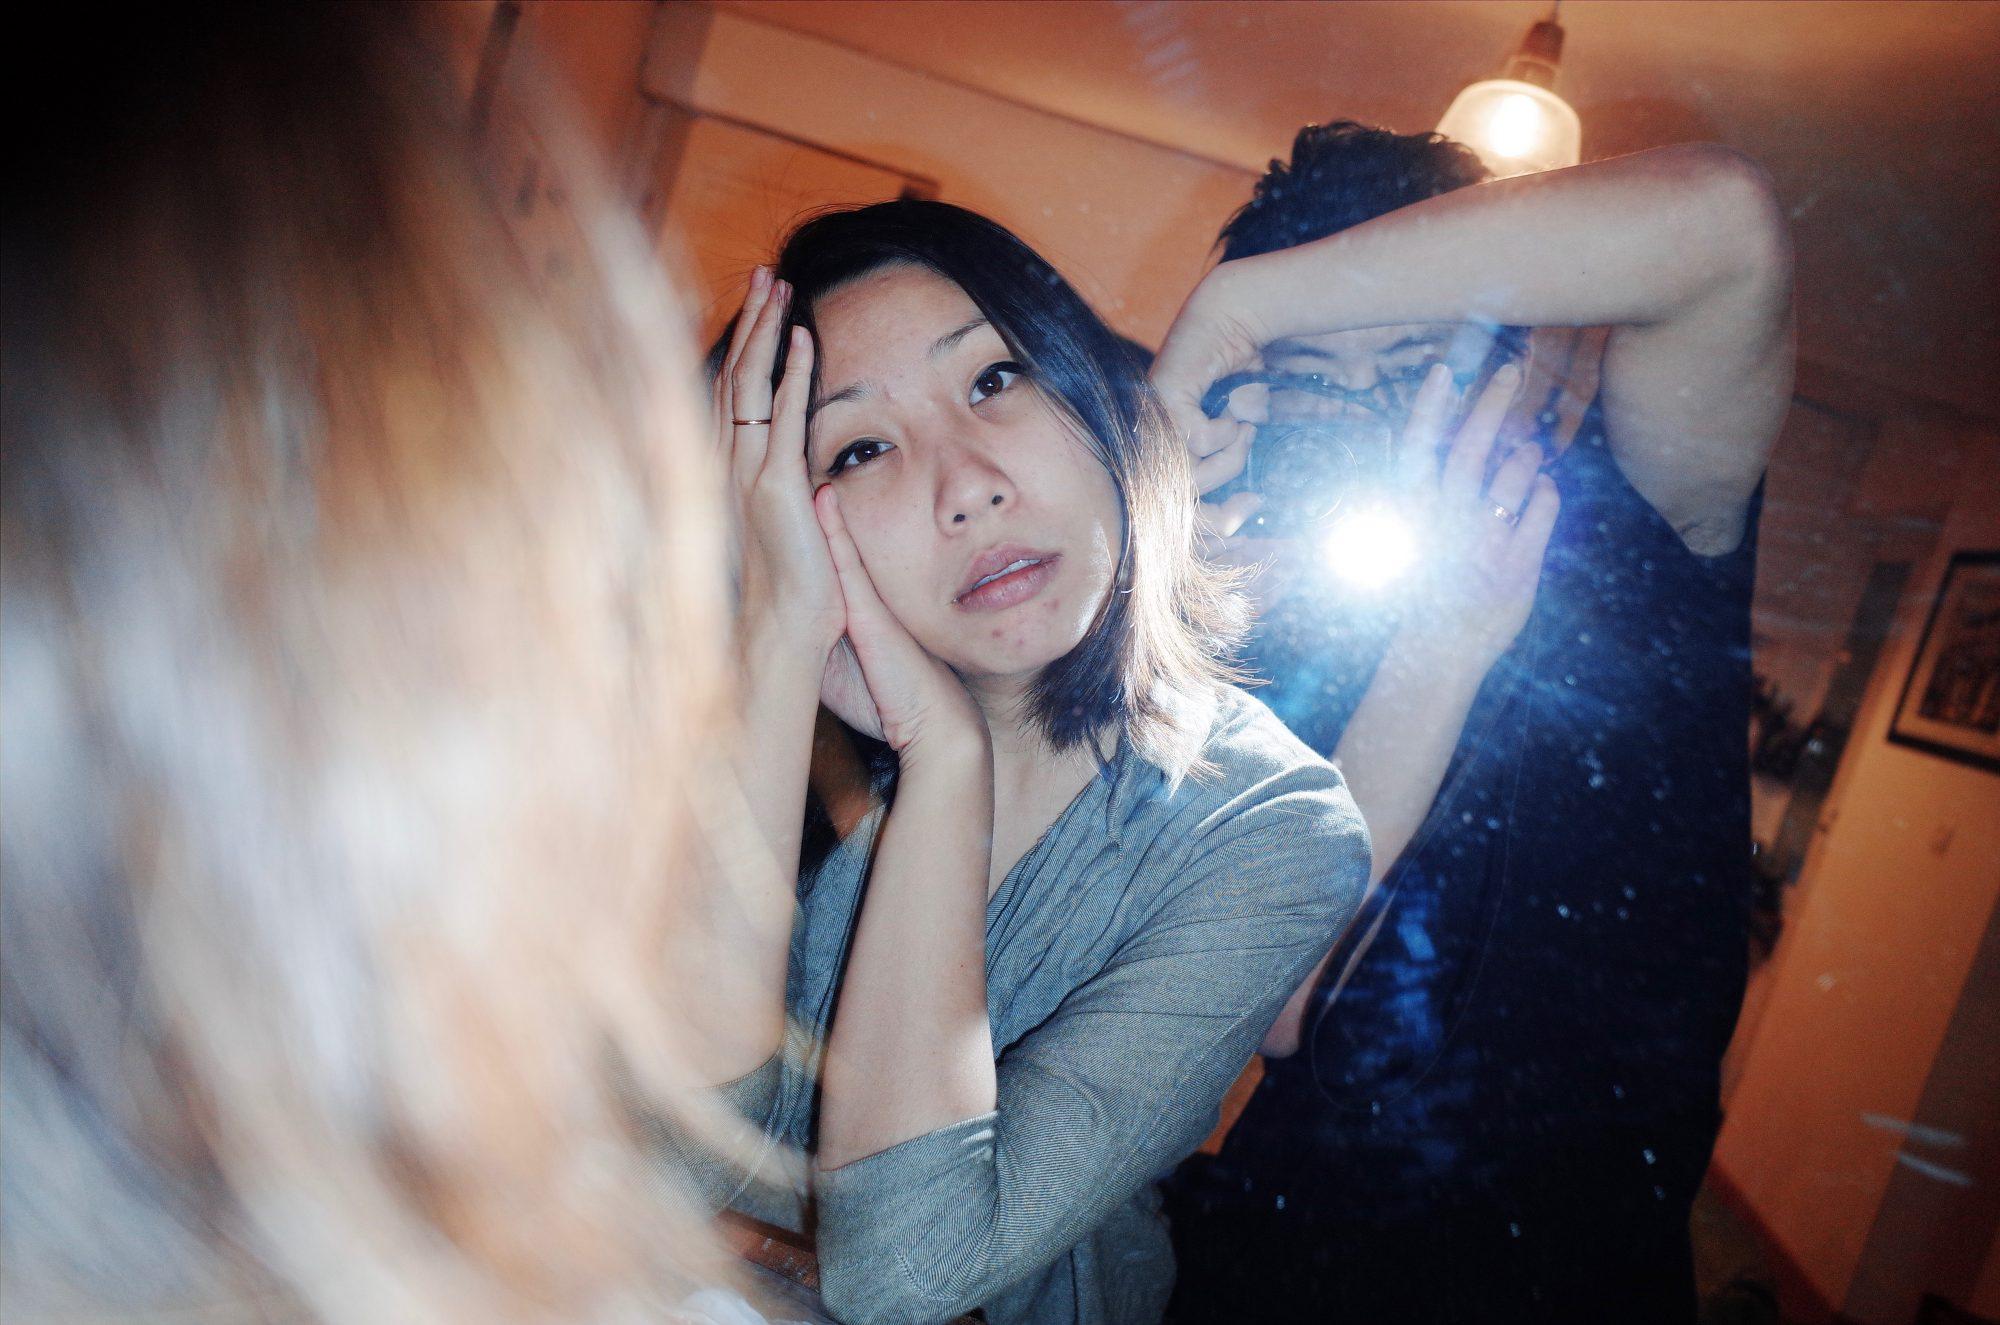 Selfie with Cindy in mirror, marseille